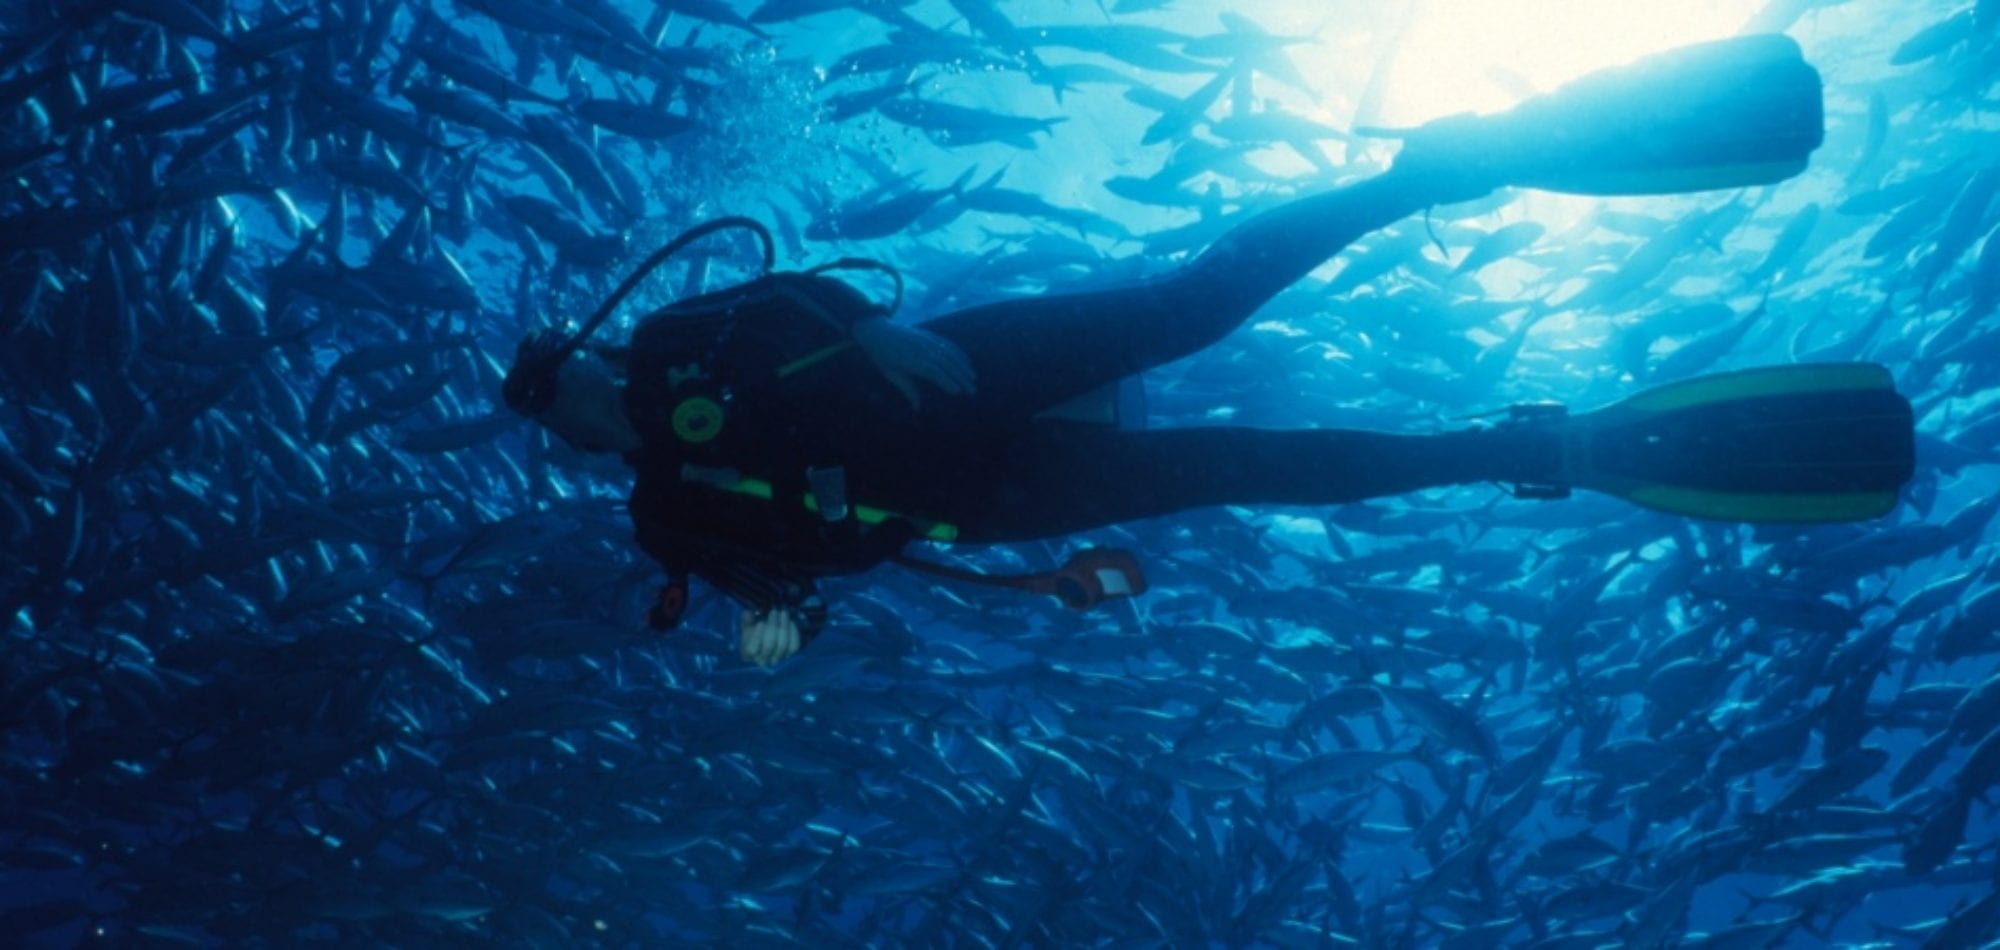 Scuba dive Australia - diver on the Great Barrier Reef, Australia